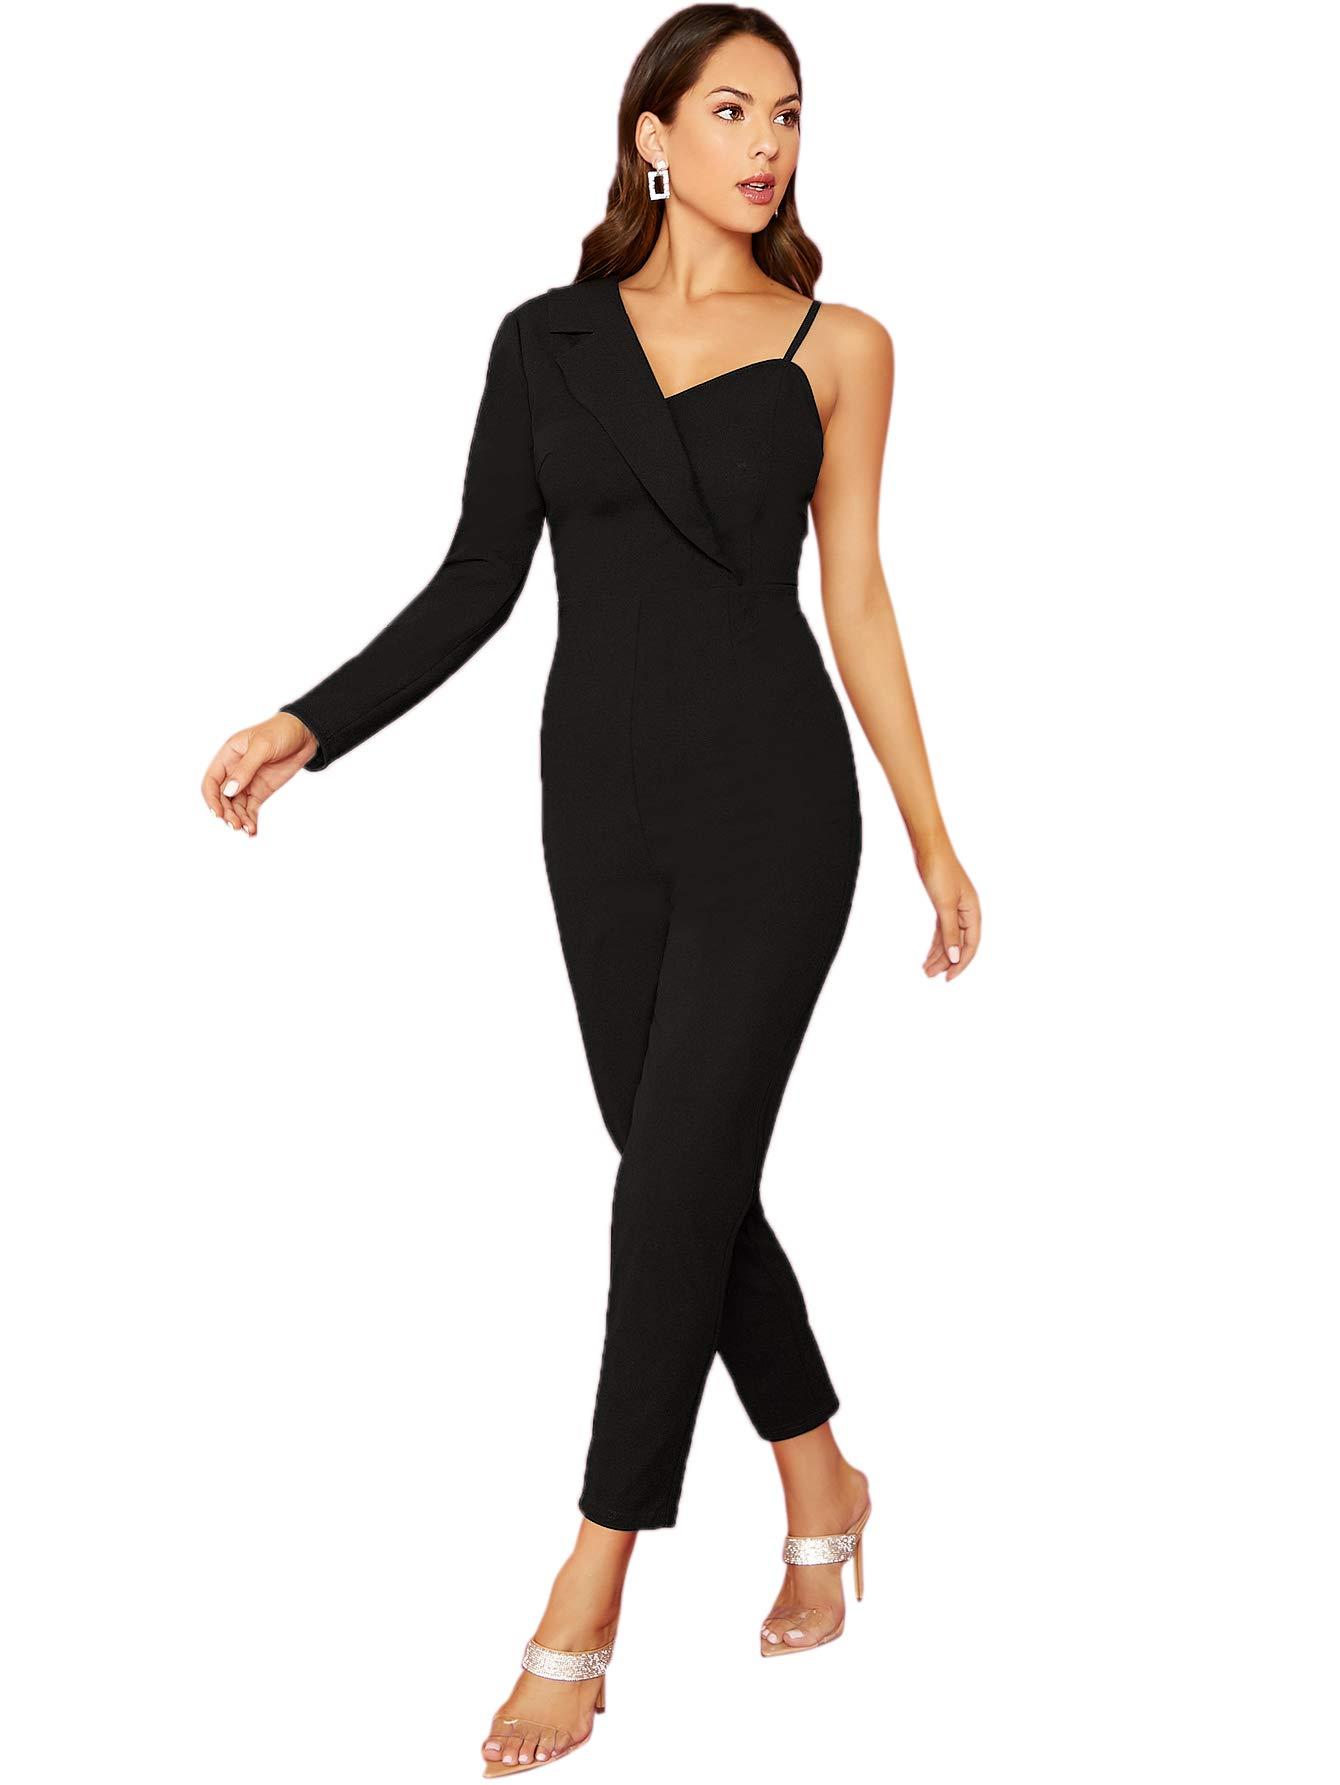 SOLY HUX Women's Elegant One Shoulder High Waist Long Sleeve Bodycon Jumpsuit